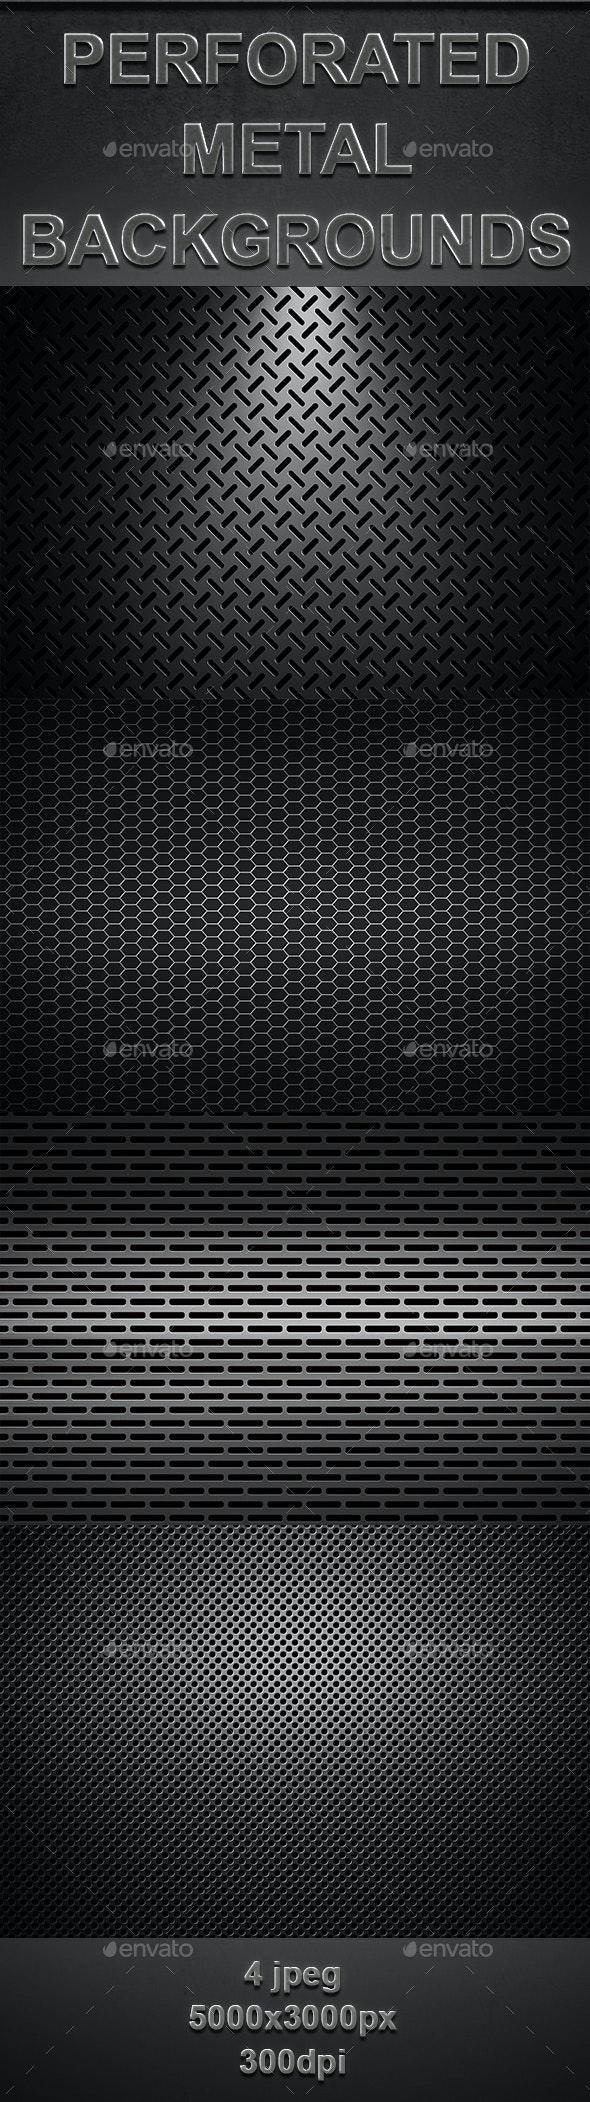 Perforated Metal Textures - Urban Backgrounds